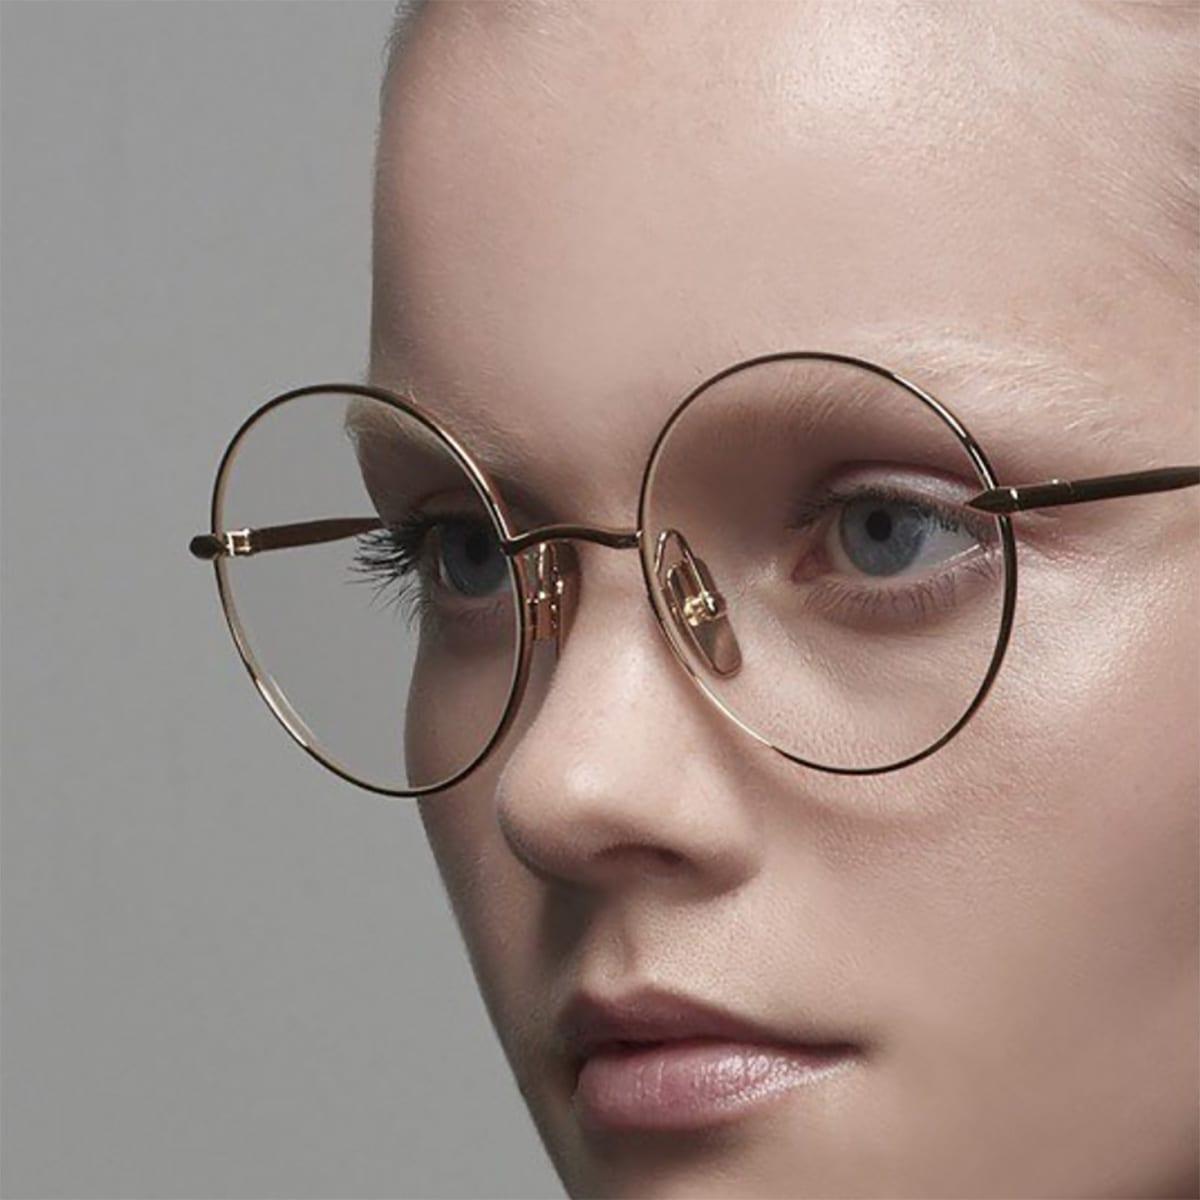 dita-eyewear-stockist-wolverhampton-shropshire-west-midlands-17